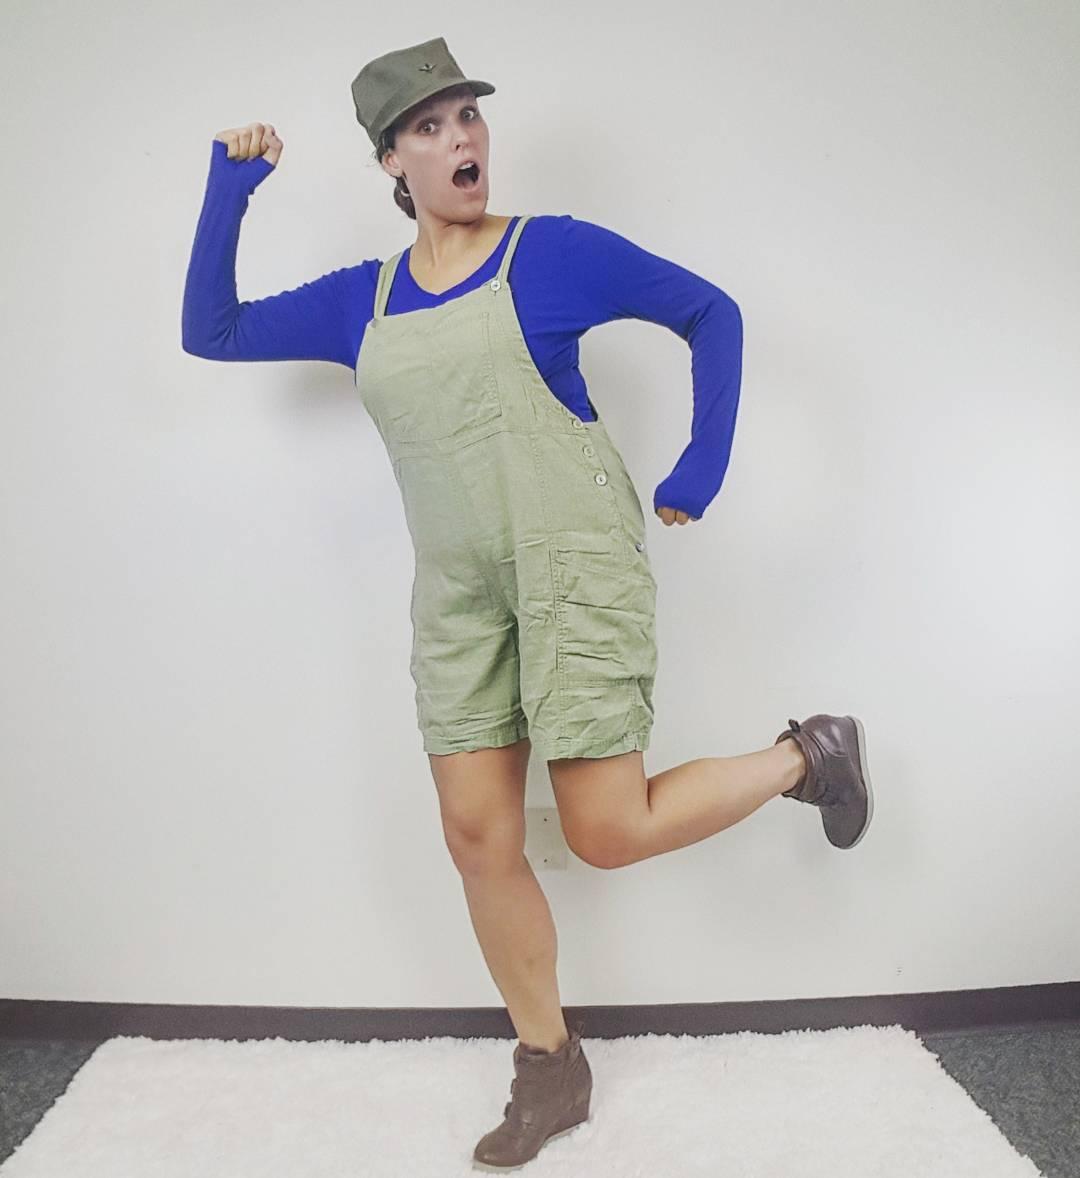 Thrift Store Cosplay Day 13 Luigi Super Mario Brothers Nintendo fashion blog post